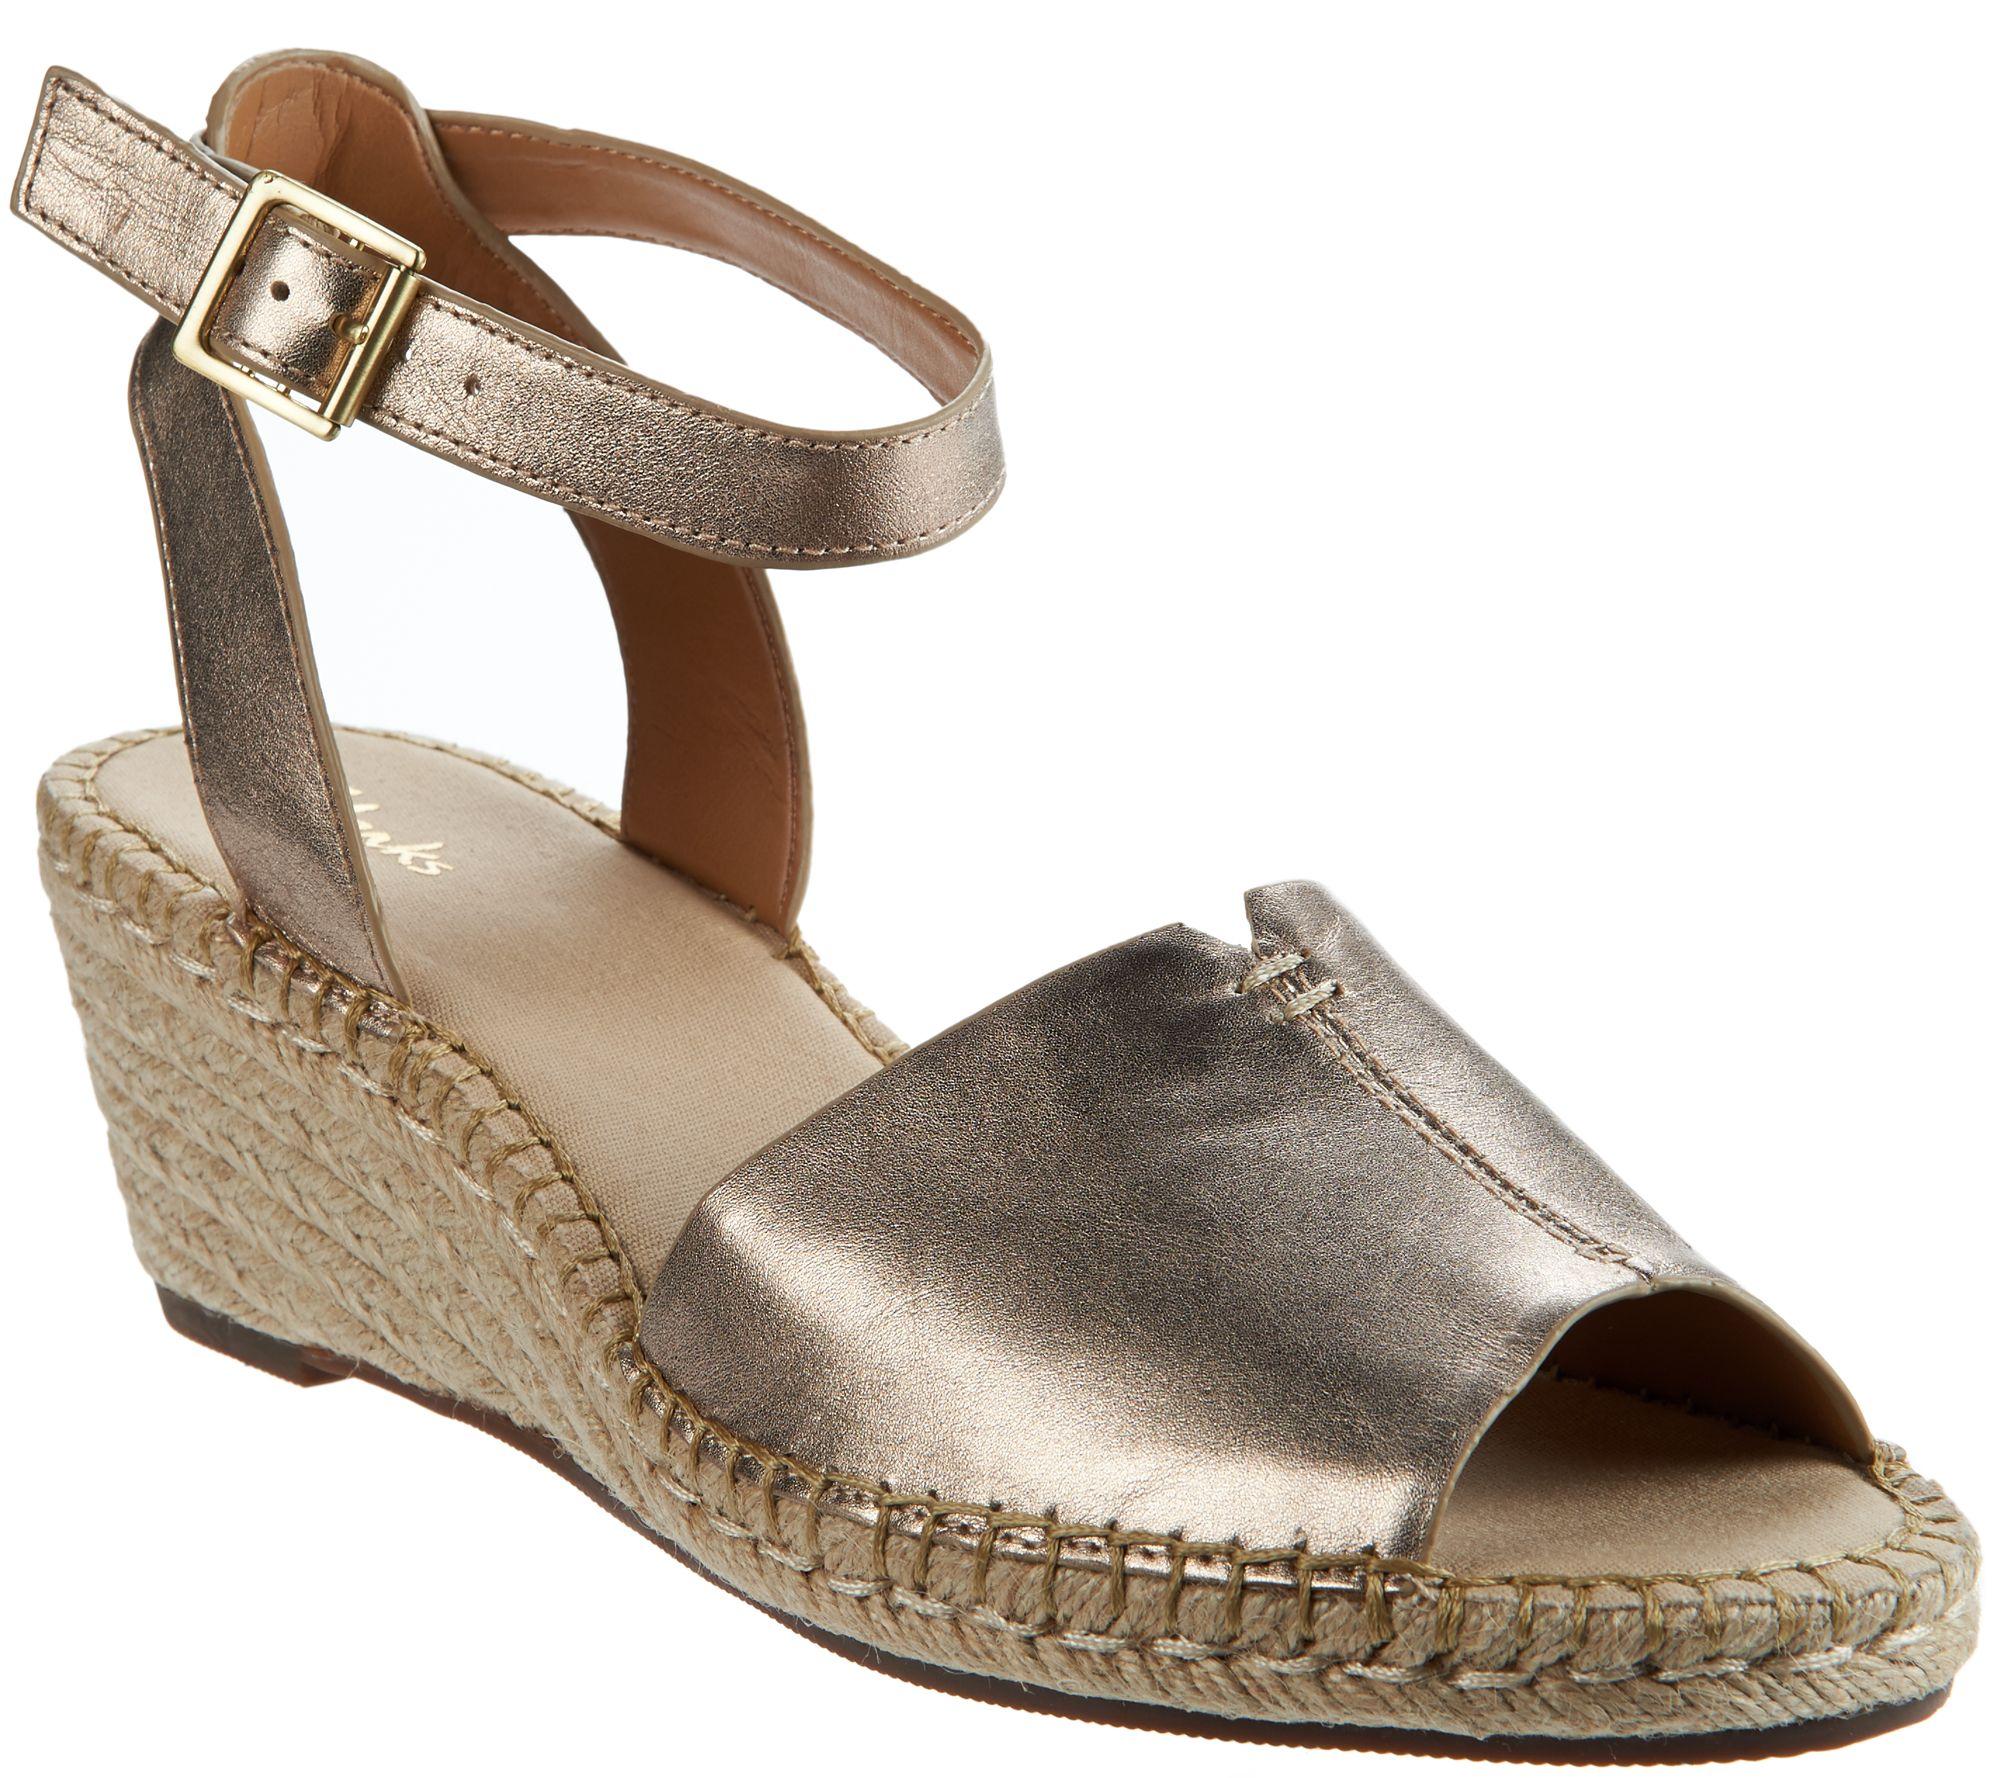 Clarks Artisan Leather Espadrille Wedge Sandals - Petrina ...